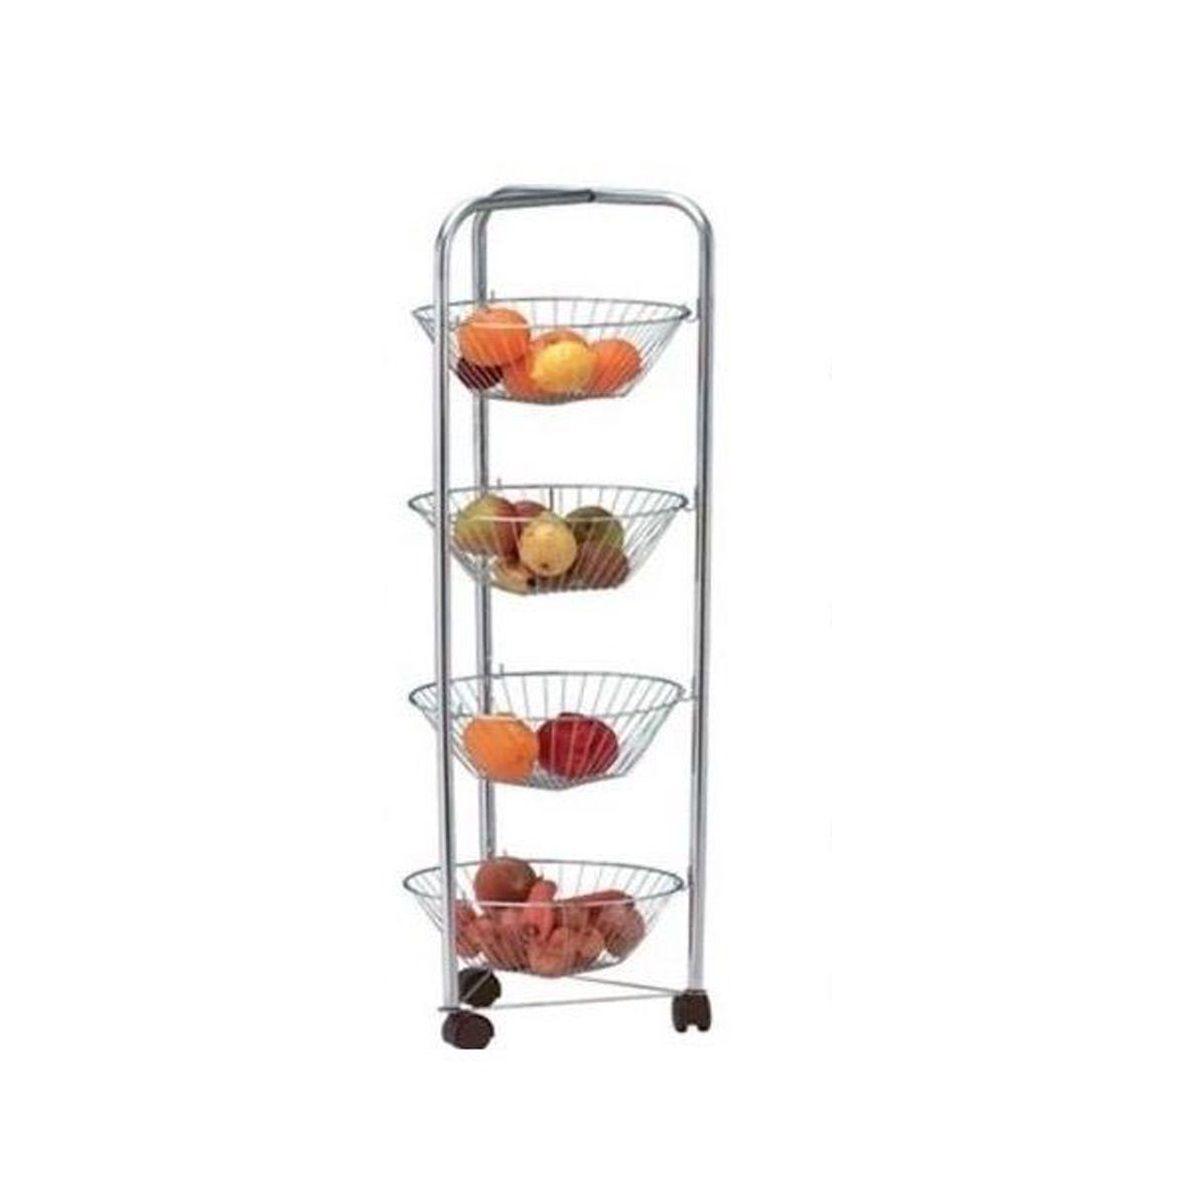 Tier Fruit Vegetable Rack Wheels Kitchen Storage Stand Cart Trolley White Shelf Chrome 4 Tier Fruit Vegetable Rack Wheels Kitchen Storage Dengan Gambar